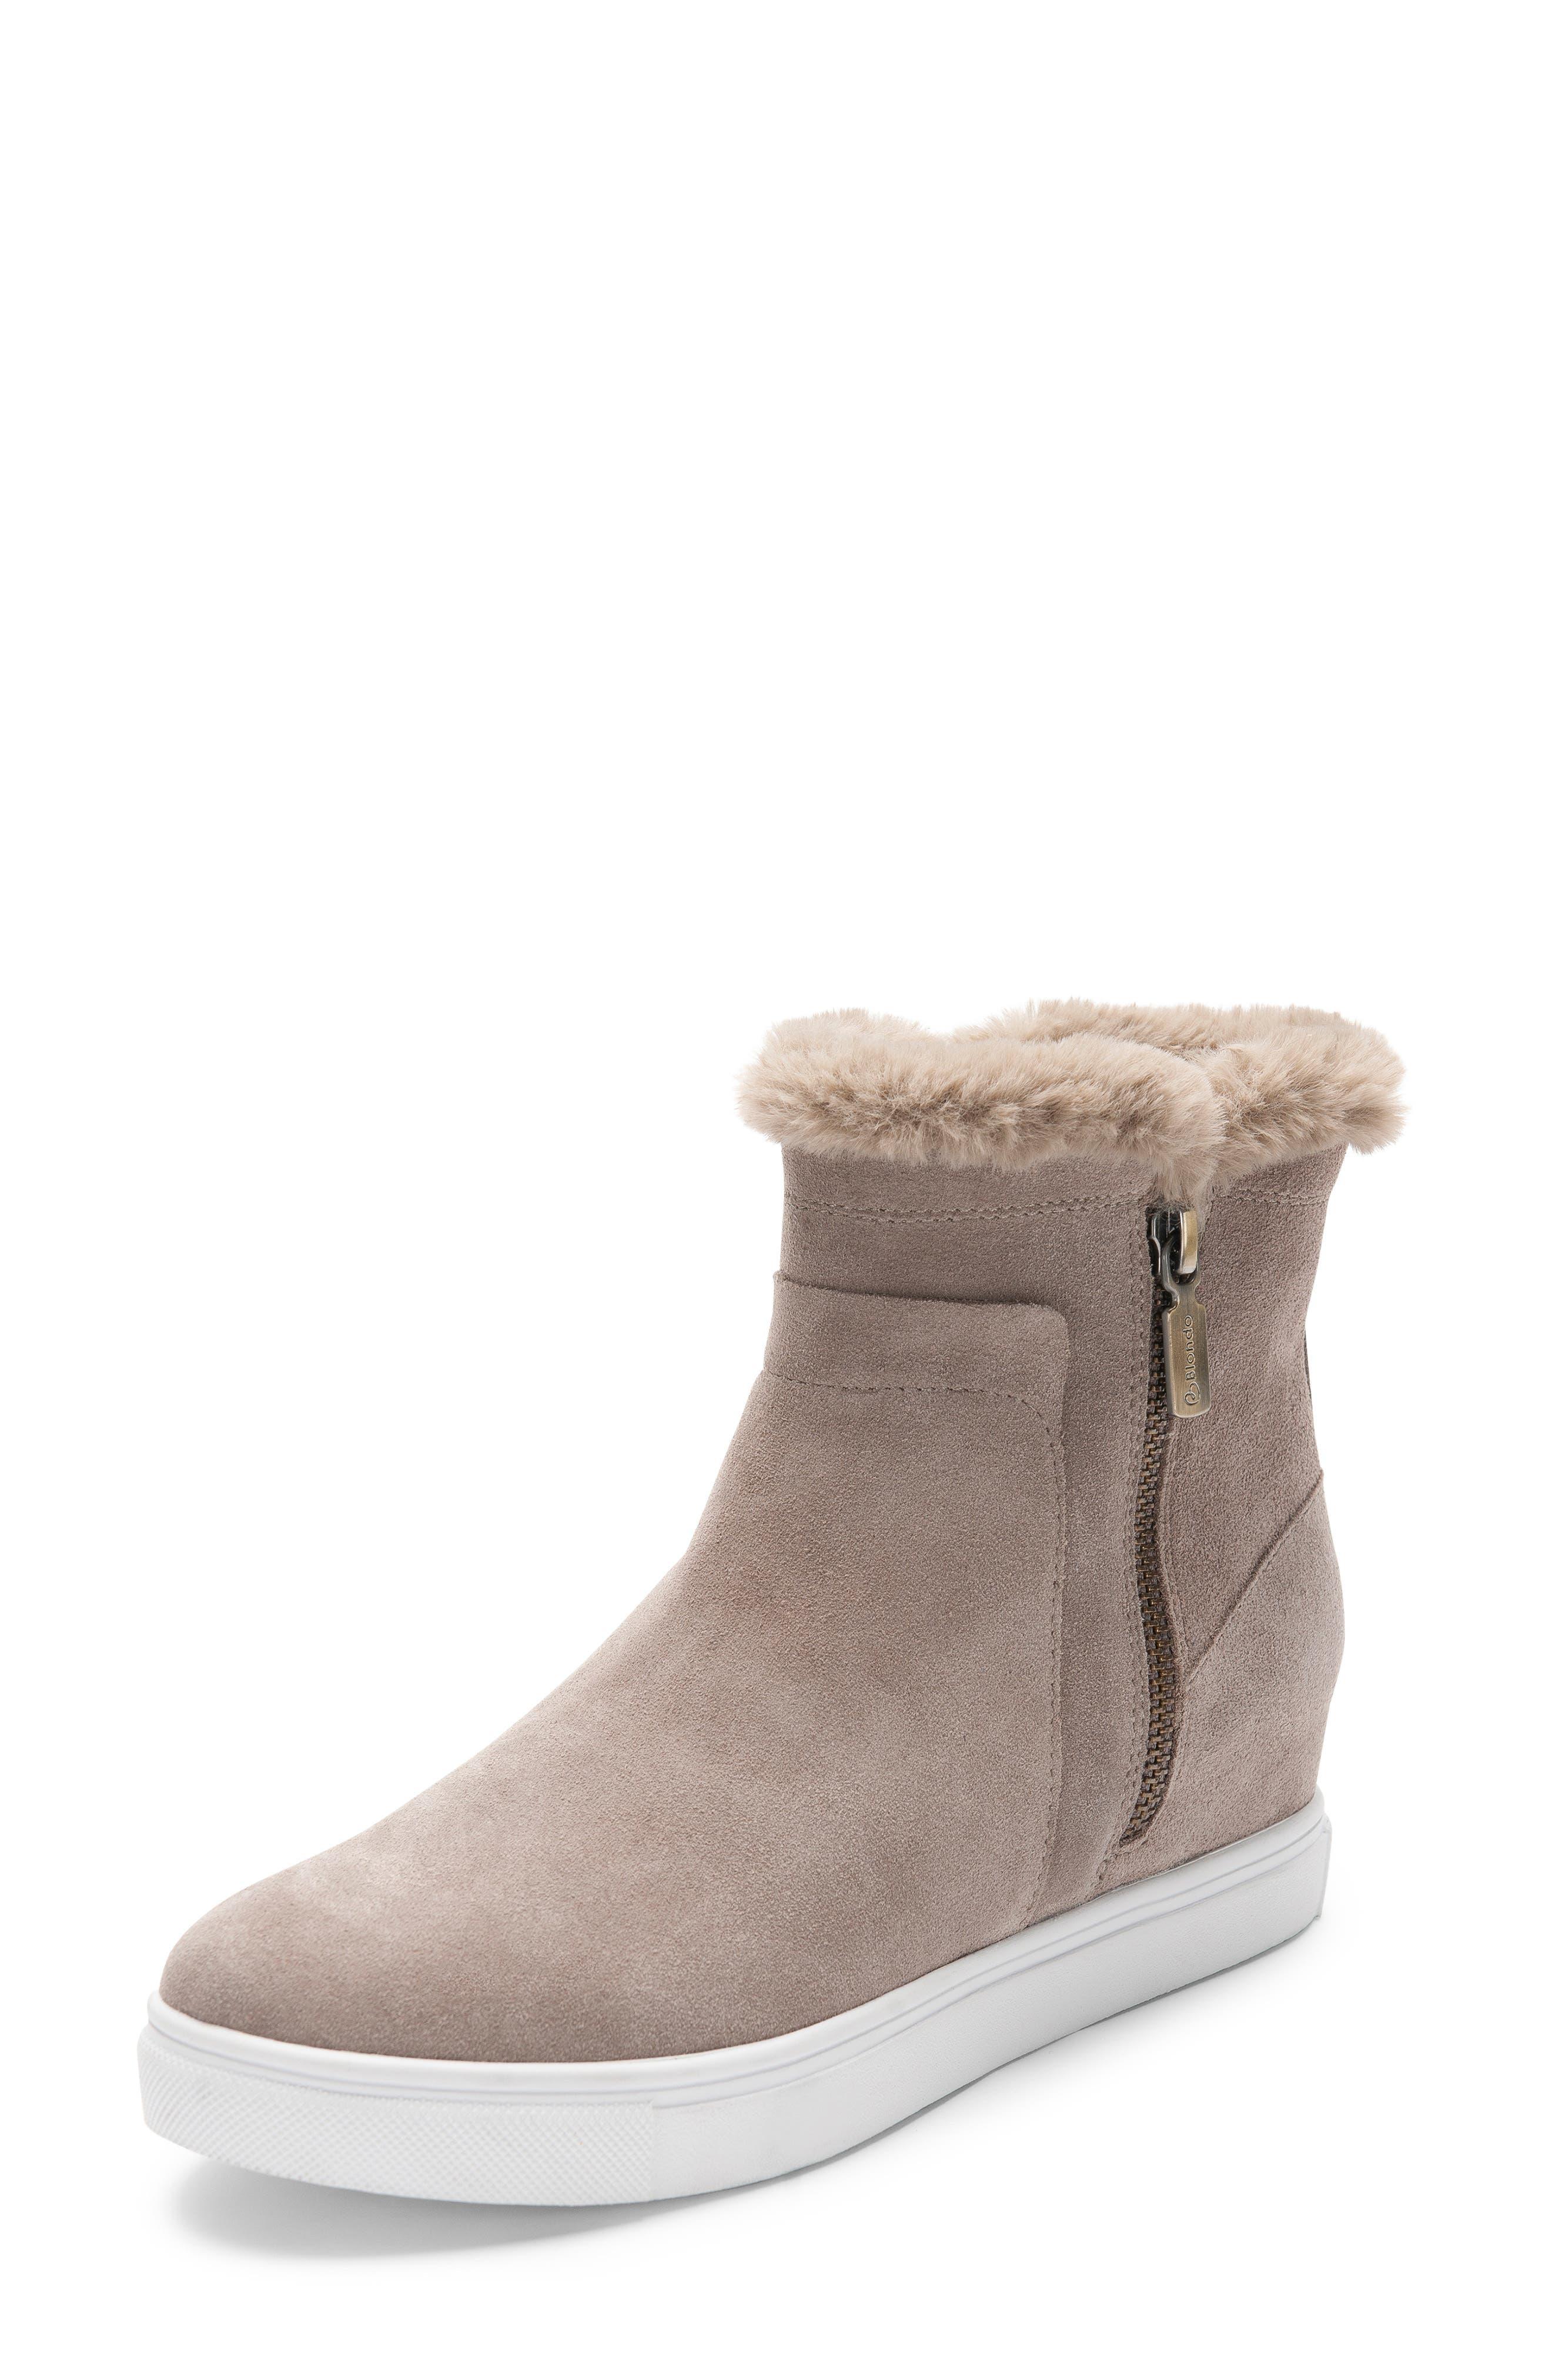 Blondo Glade Waterproof Sneaker- Grey